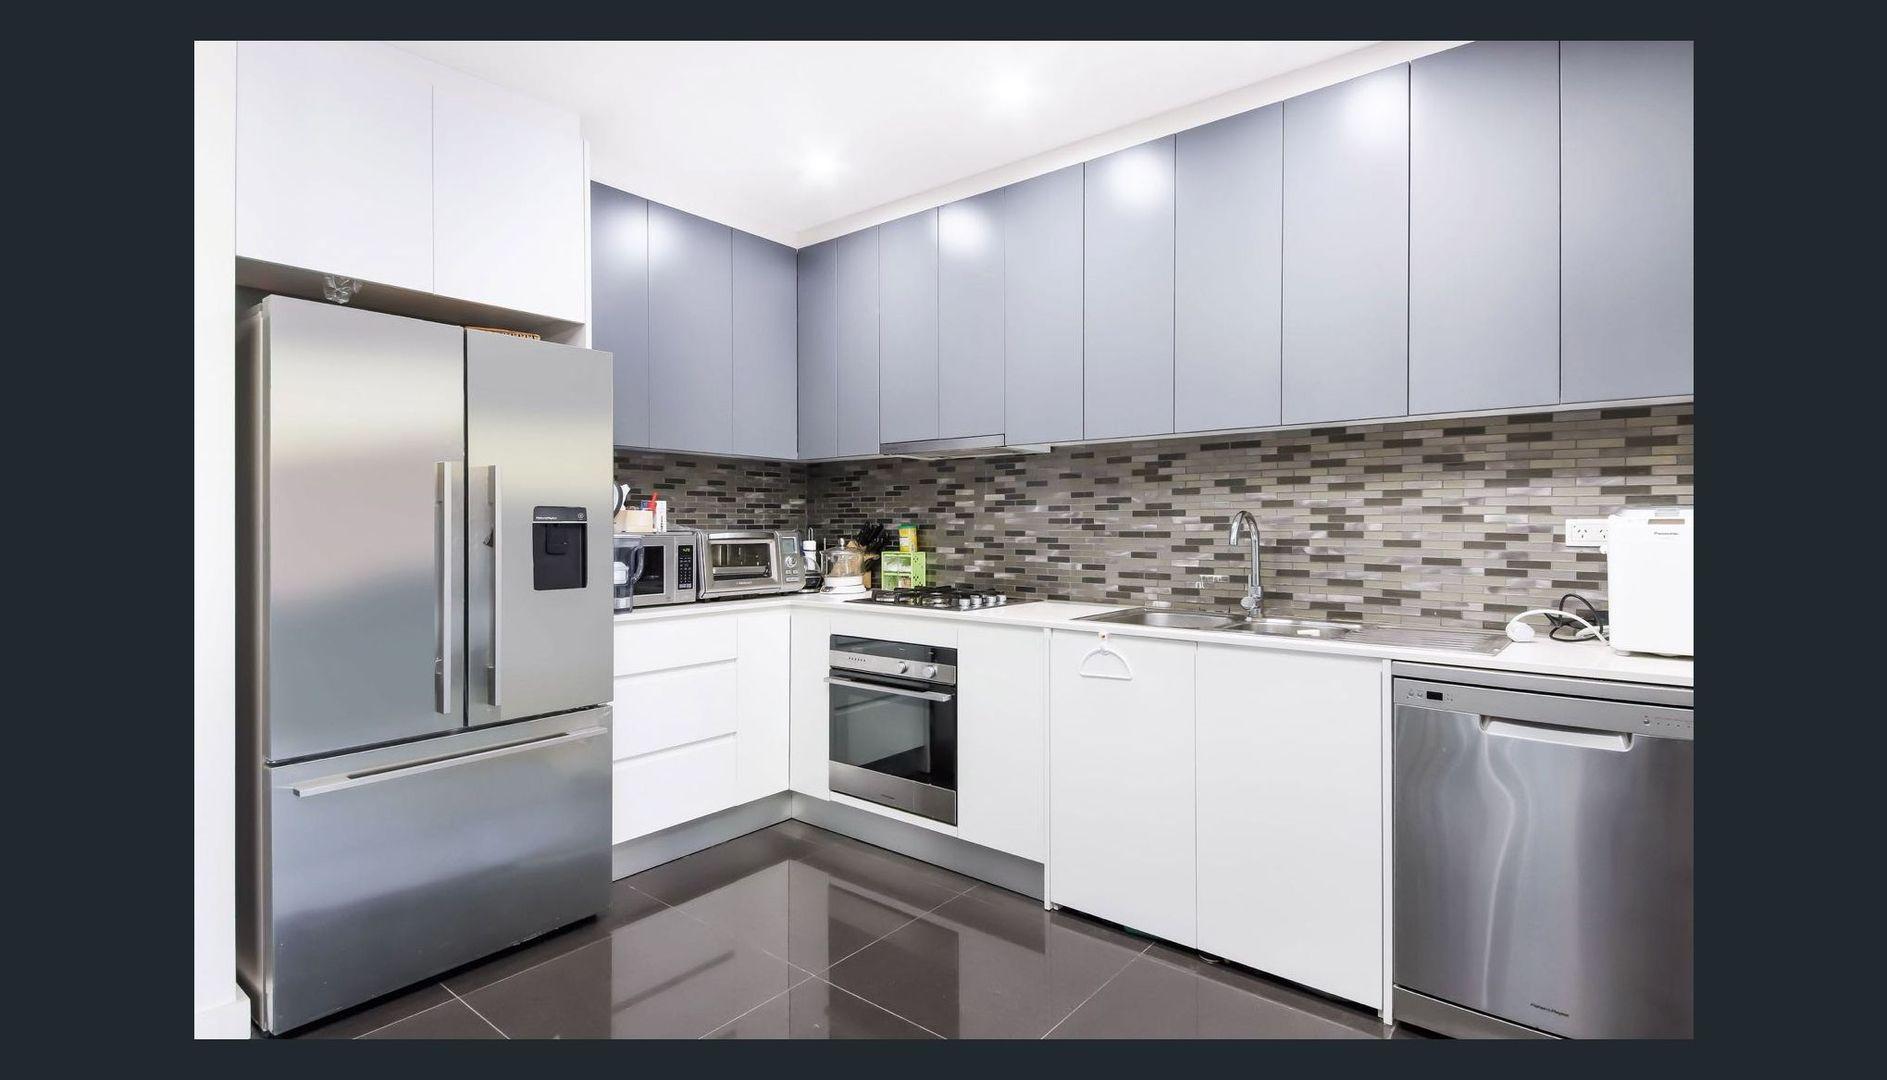 2/209-211 Carlingford Rd, Carlingford NSW 2118, Image 1